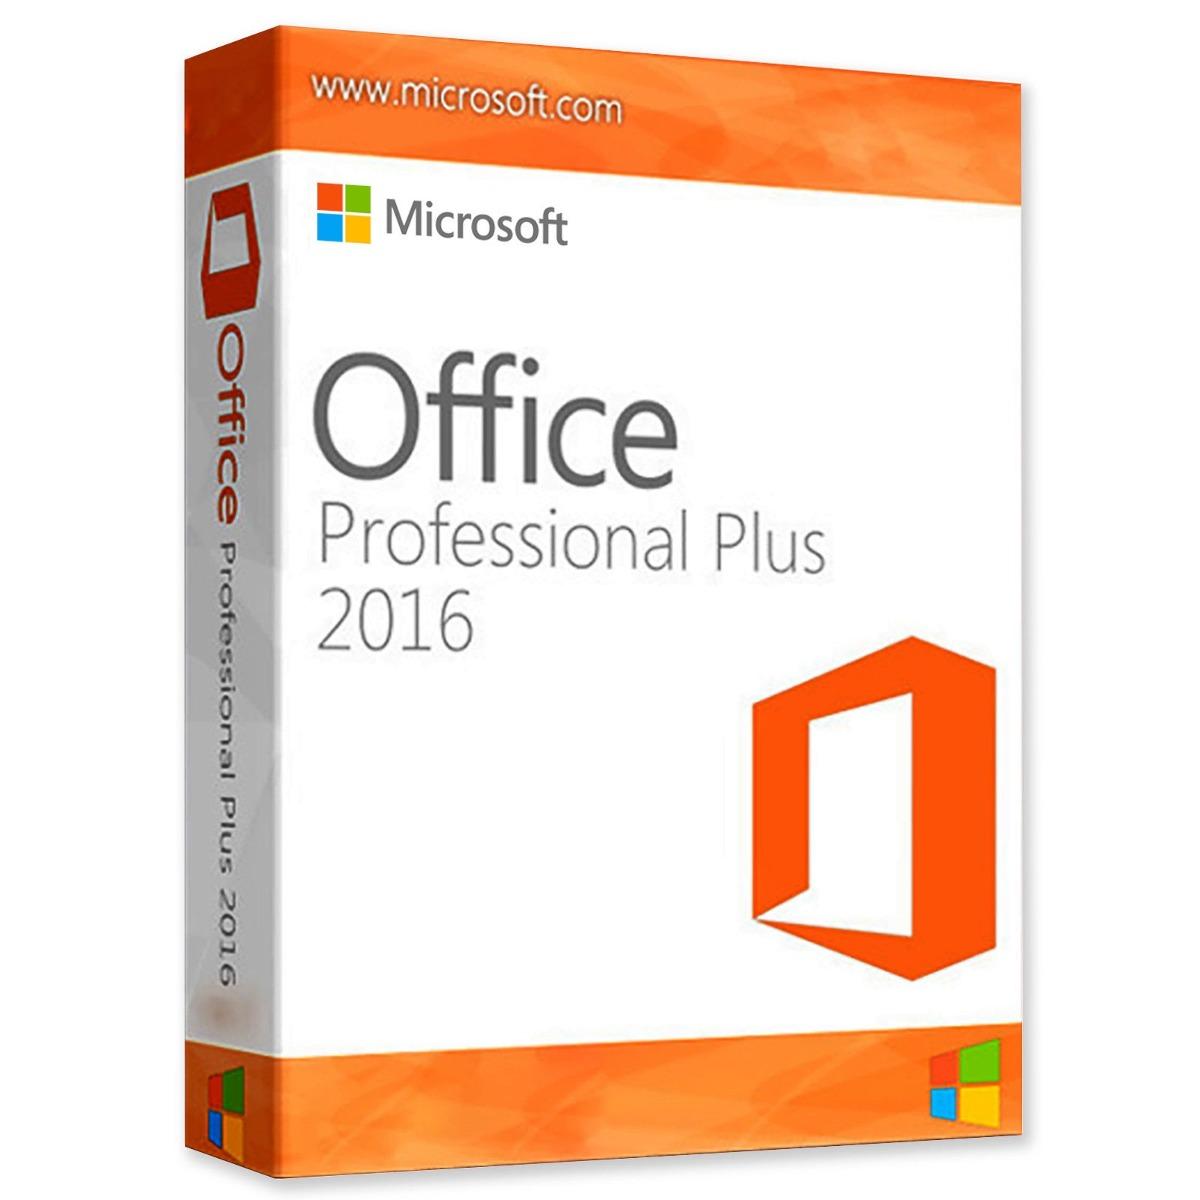 Microsoft Office 2016 [x86/x64][Español][Google-Drive]